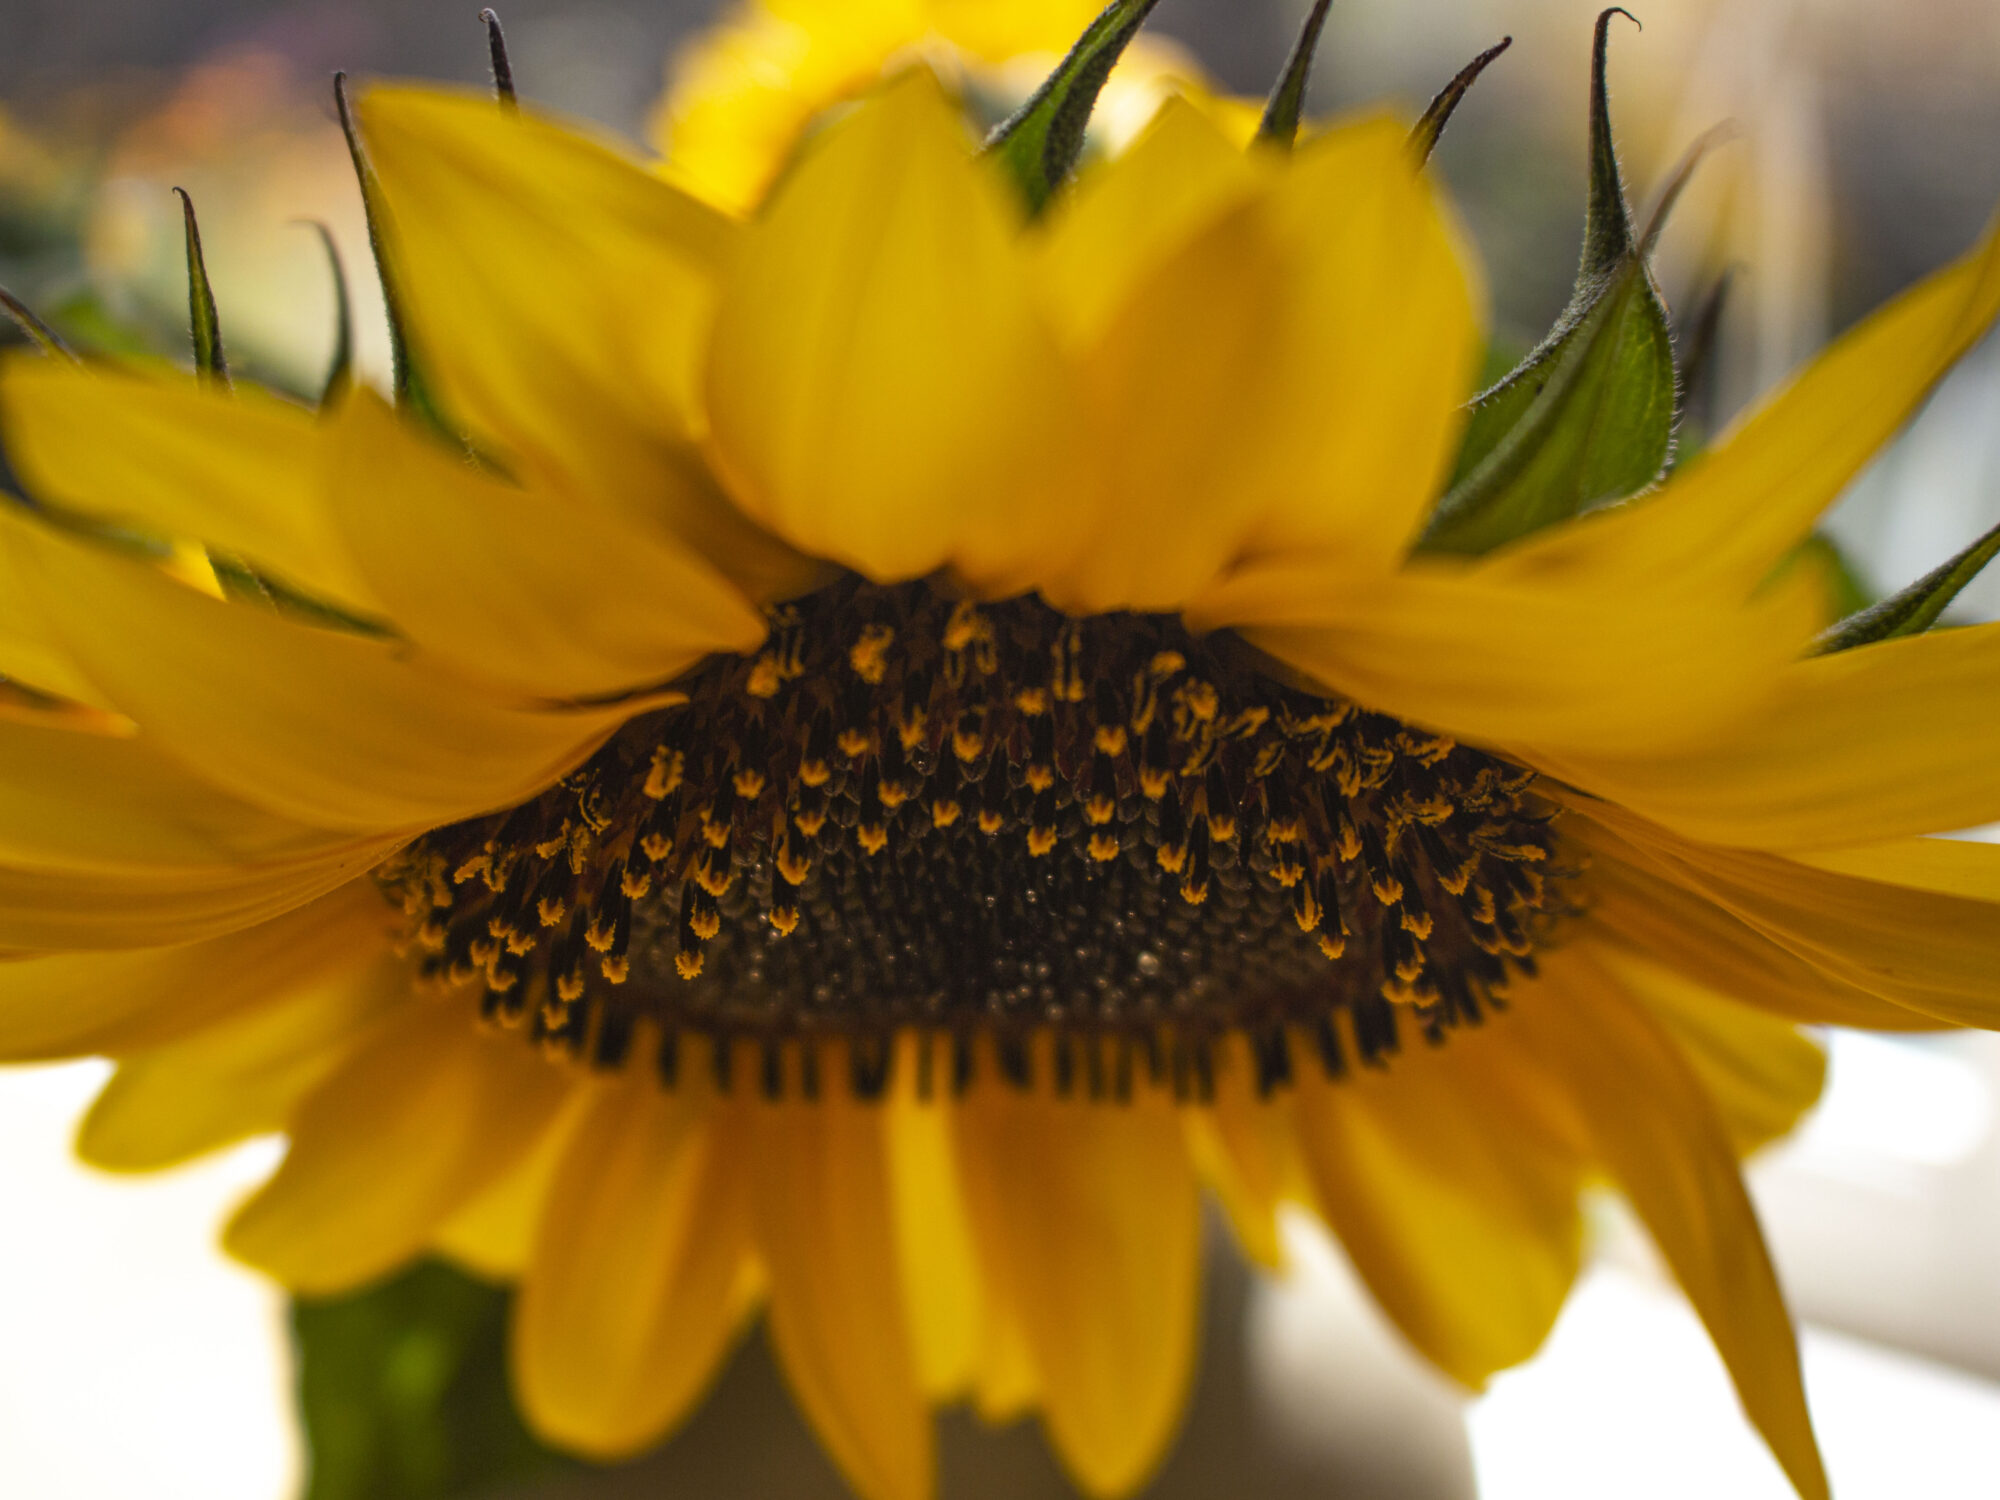 Plant gule & smukke solsikker